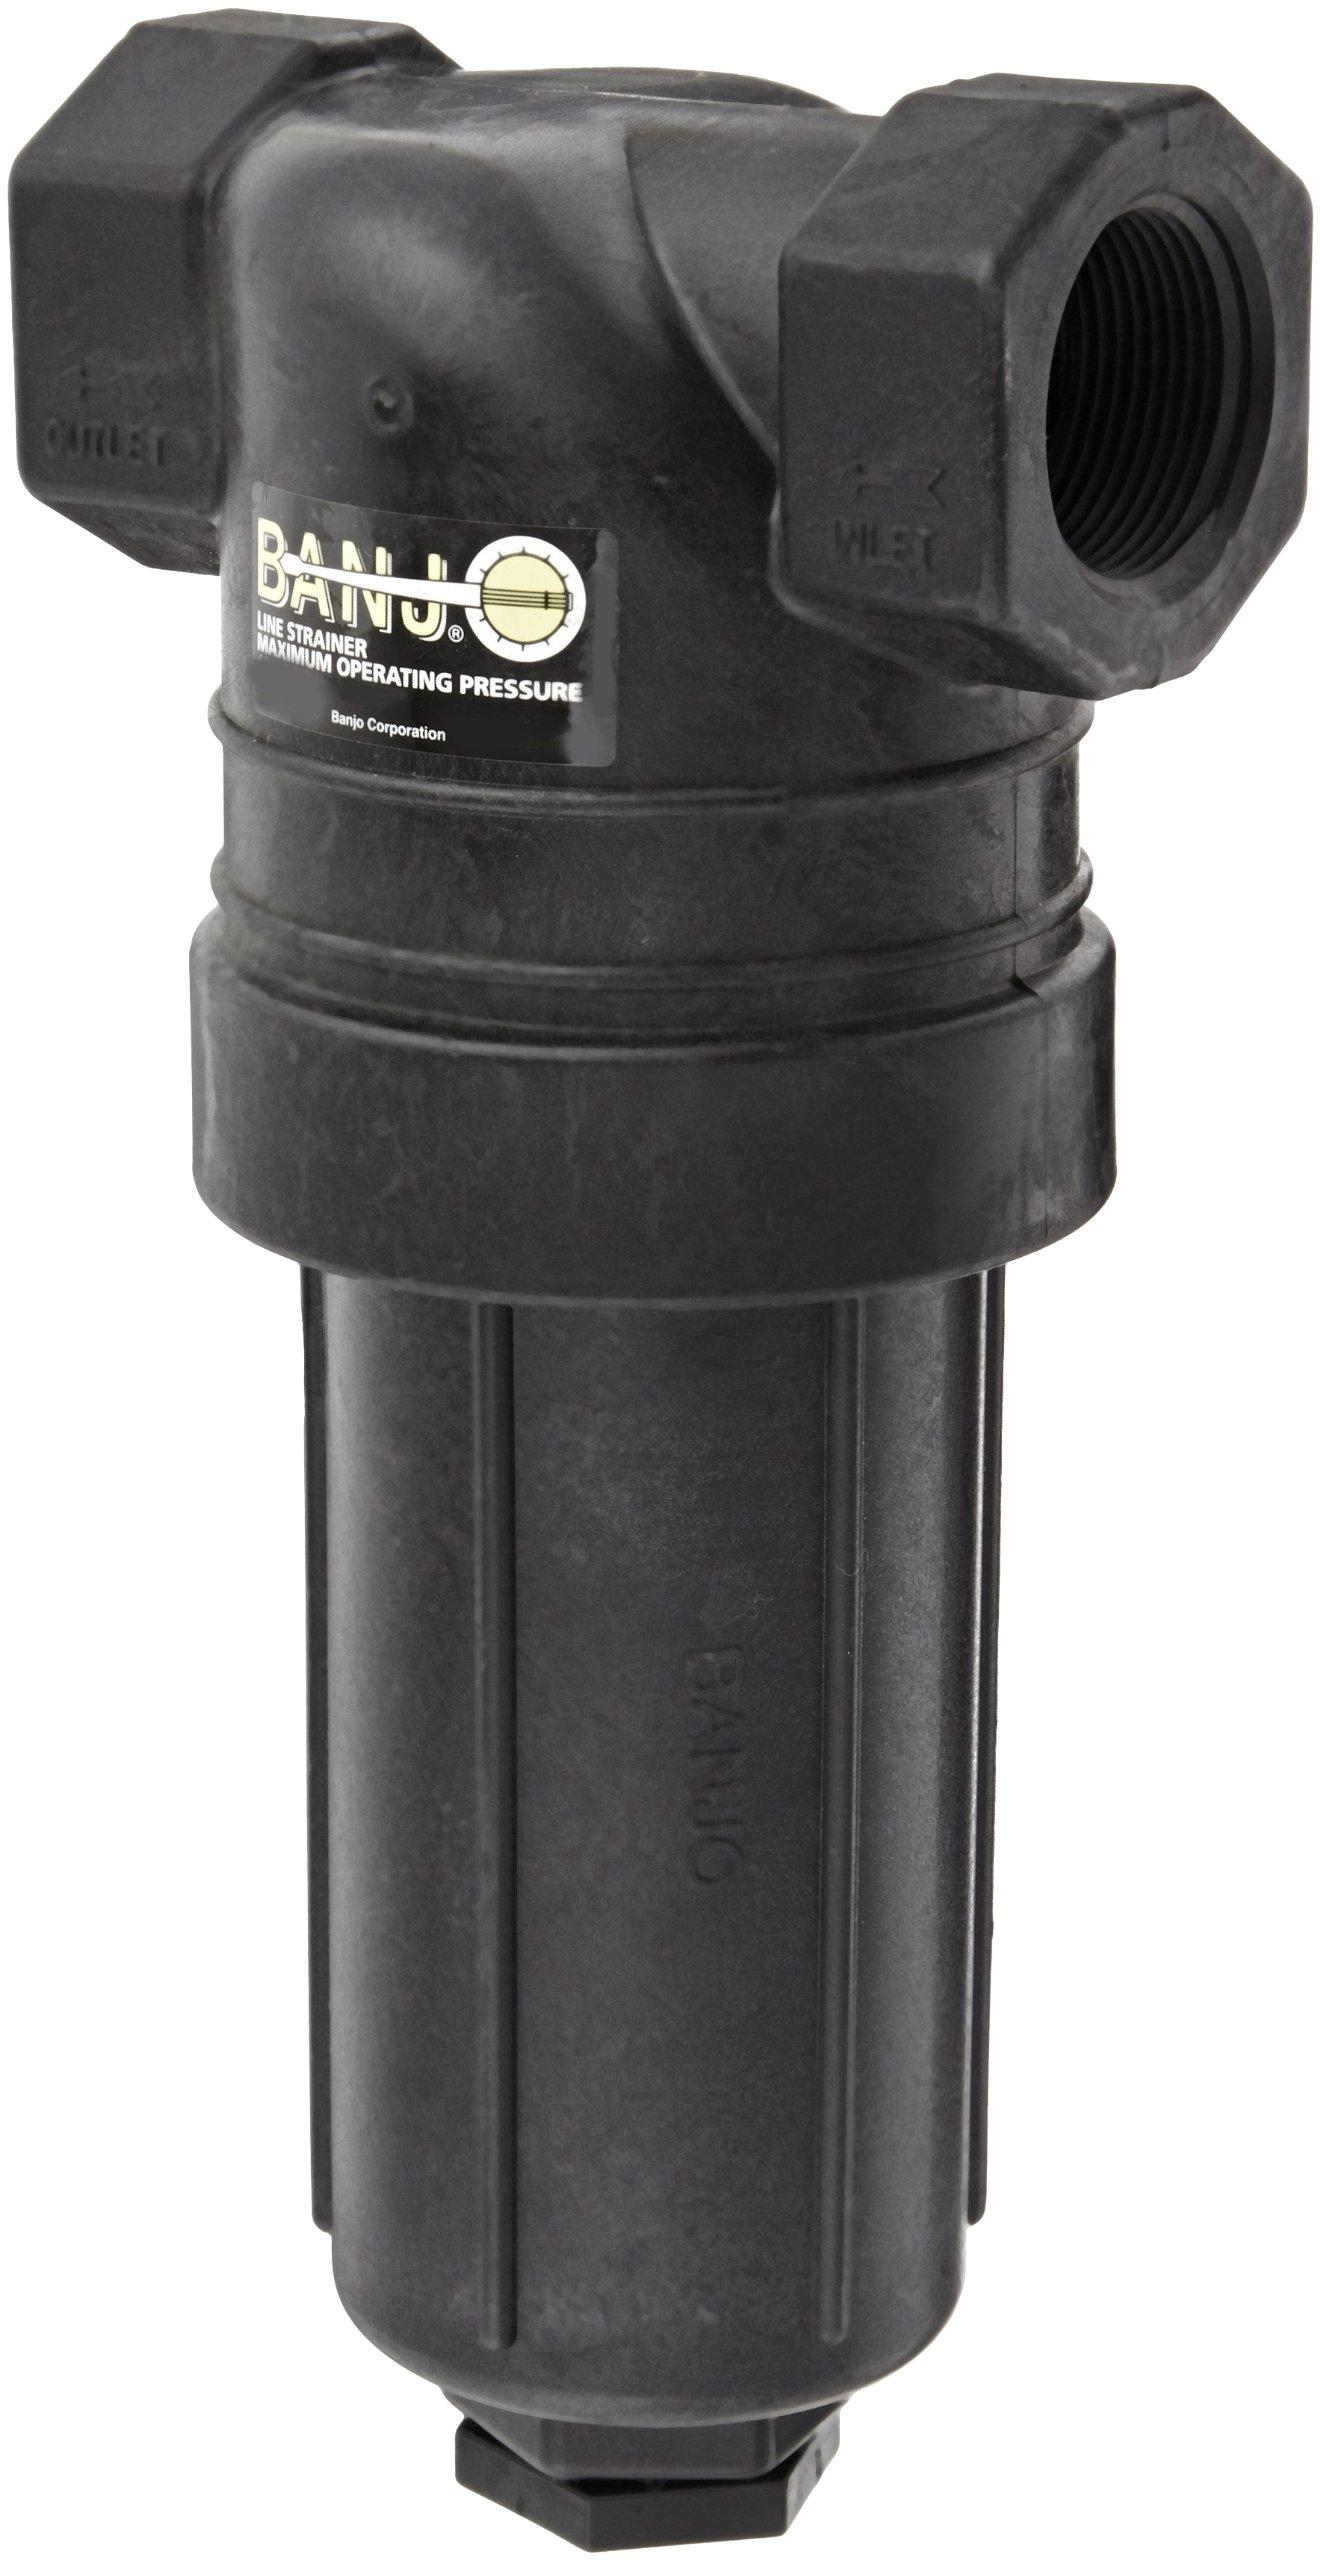 Banjo LST125-100 Polypropylene T-Strainer, 100 Mesh, 1-1/4'' NPT Female